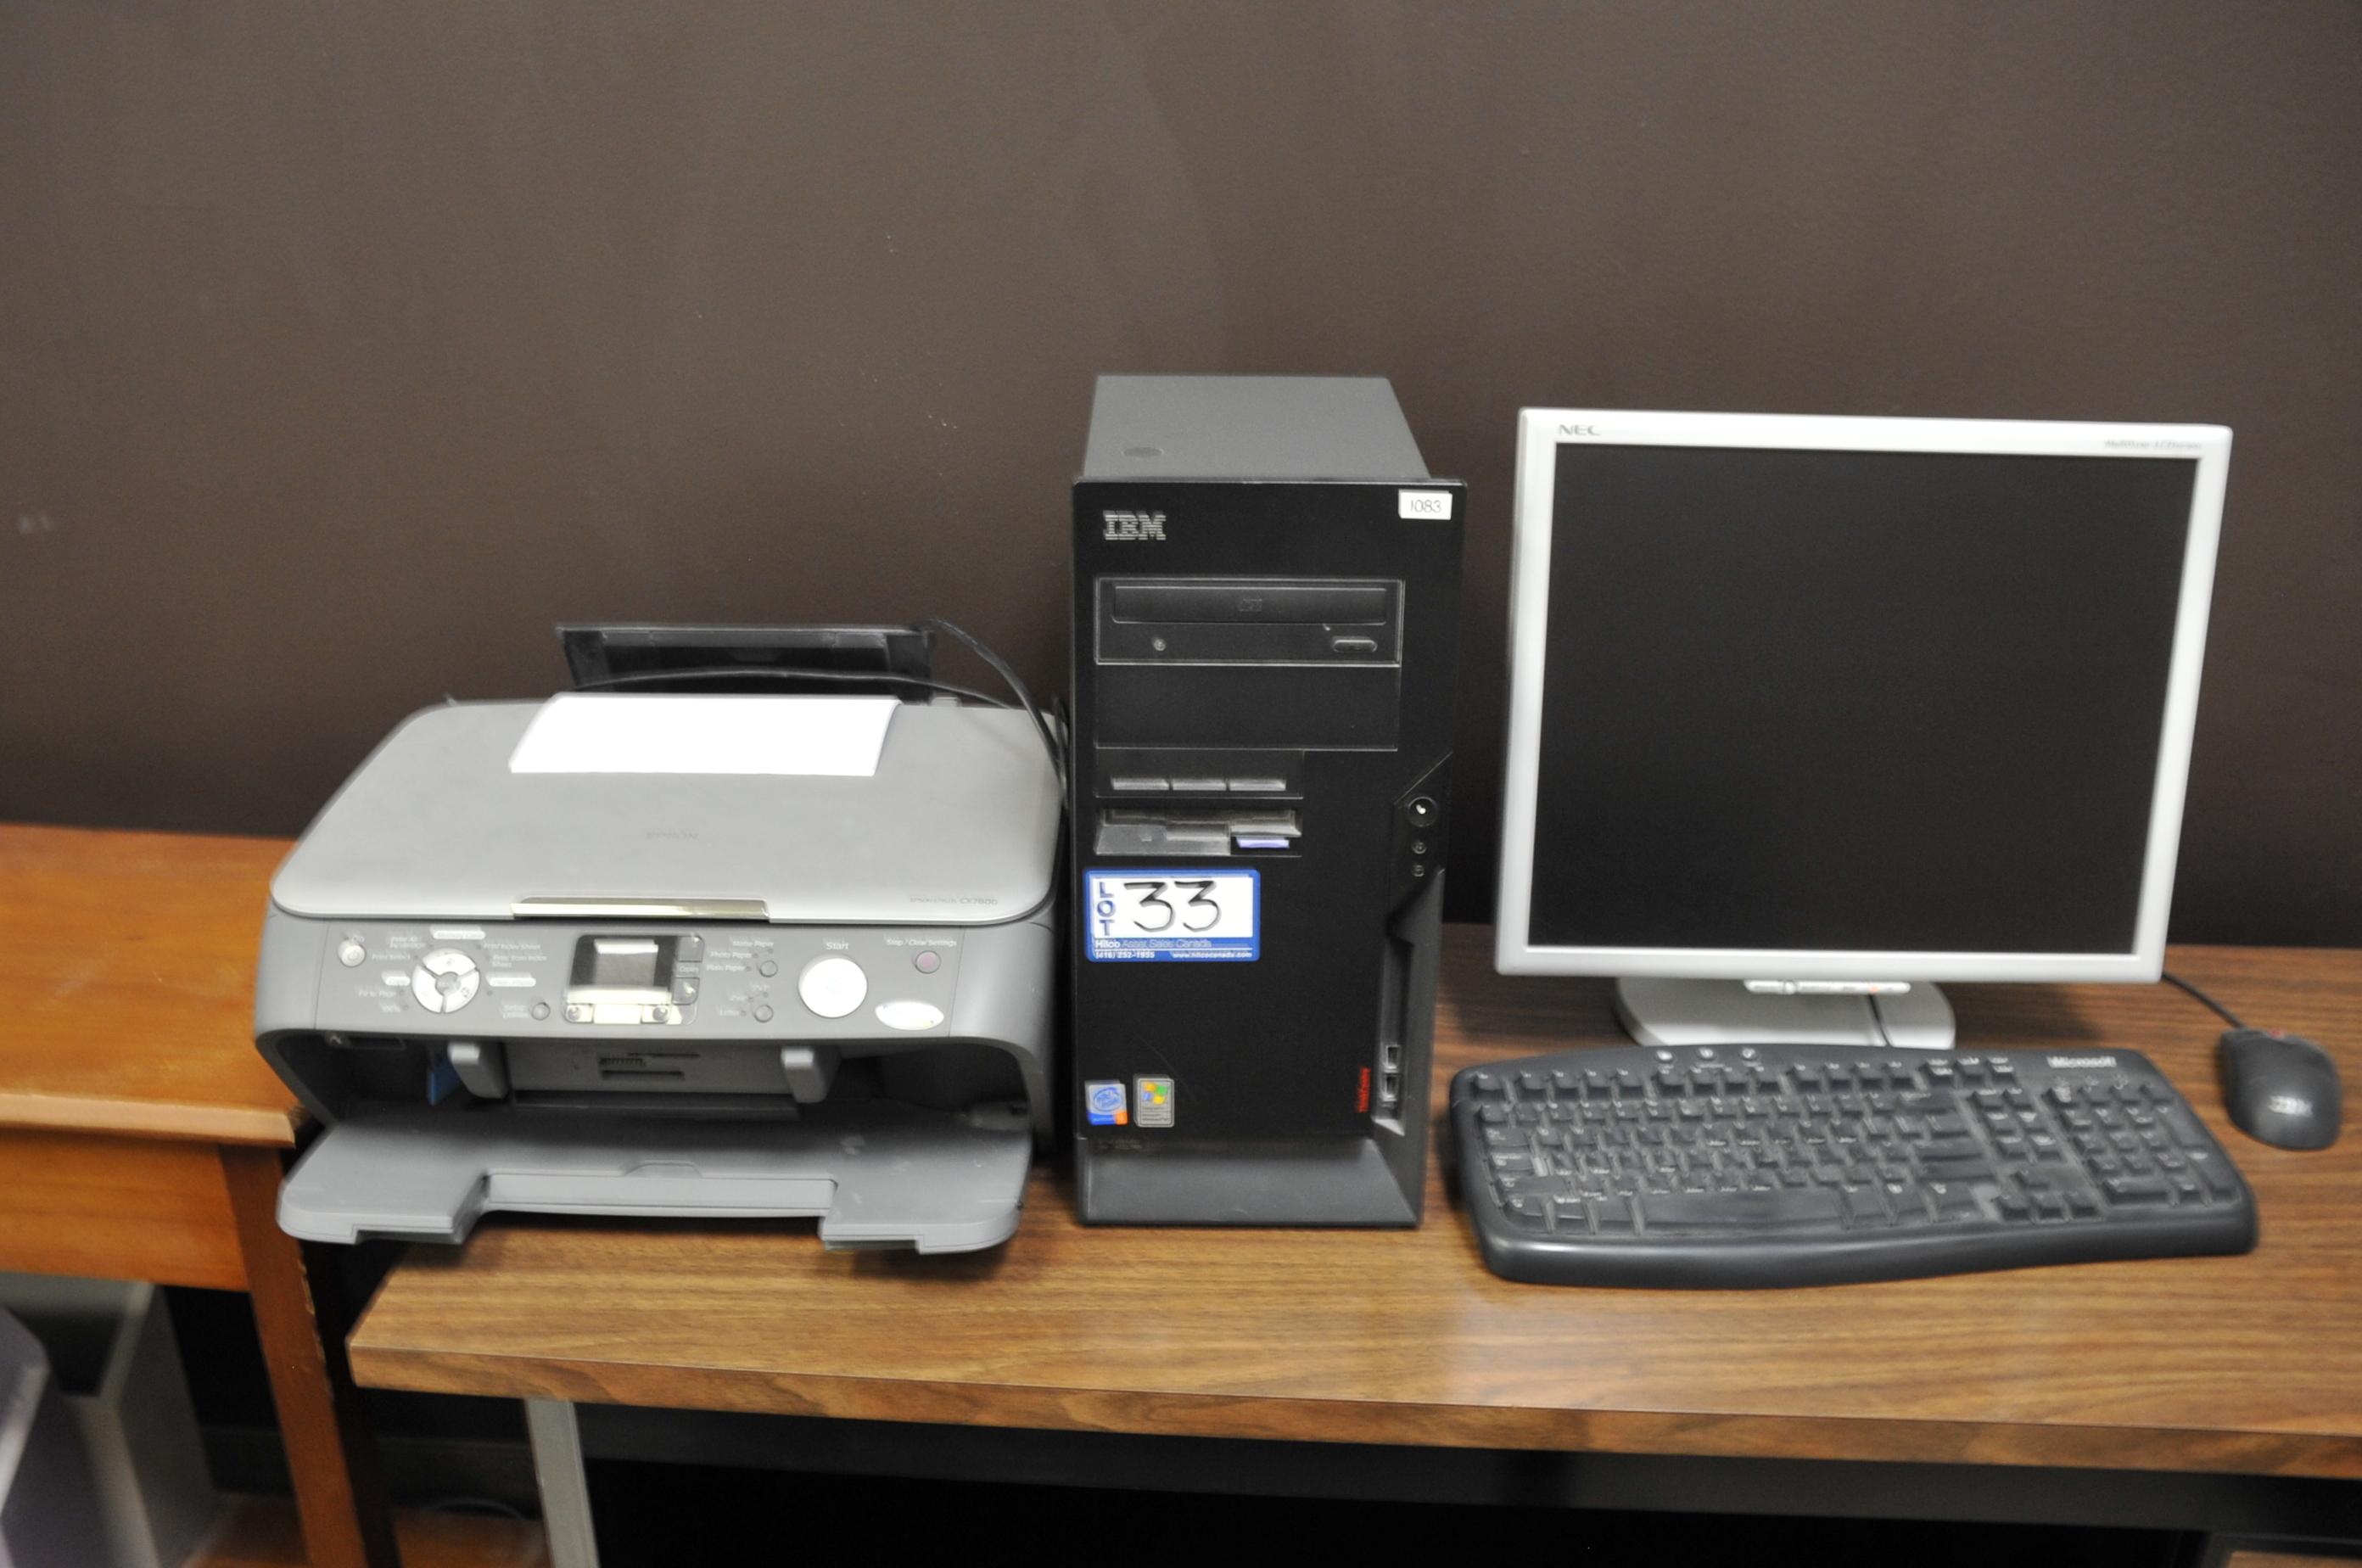 IBM Model P4 Computer; with LCD Monitor, Printer